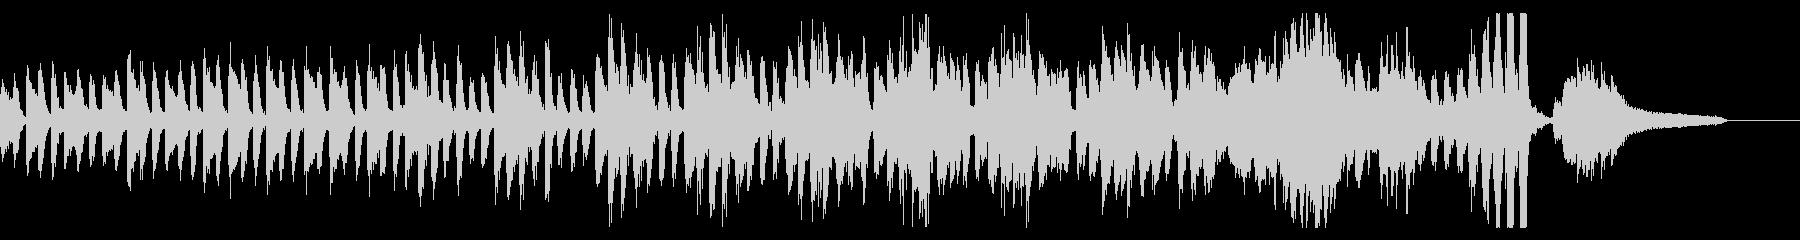 KANT混乱の雰囲気を出すピアノ曲の未再生の波形